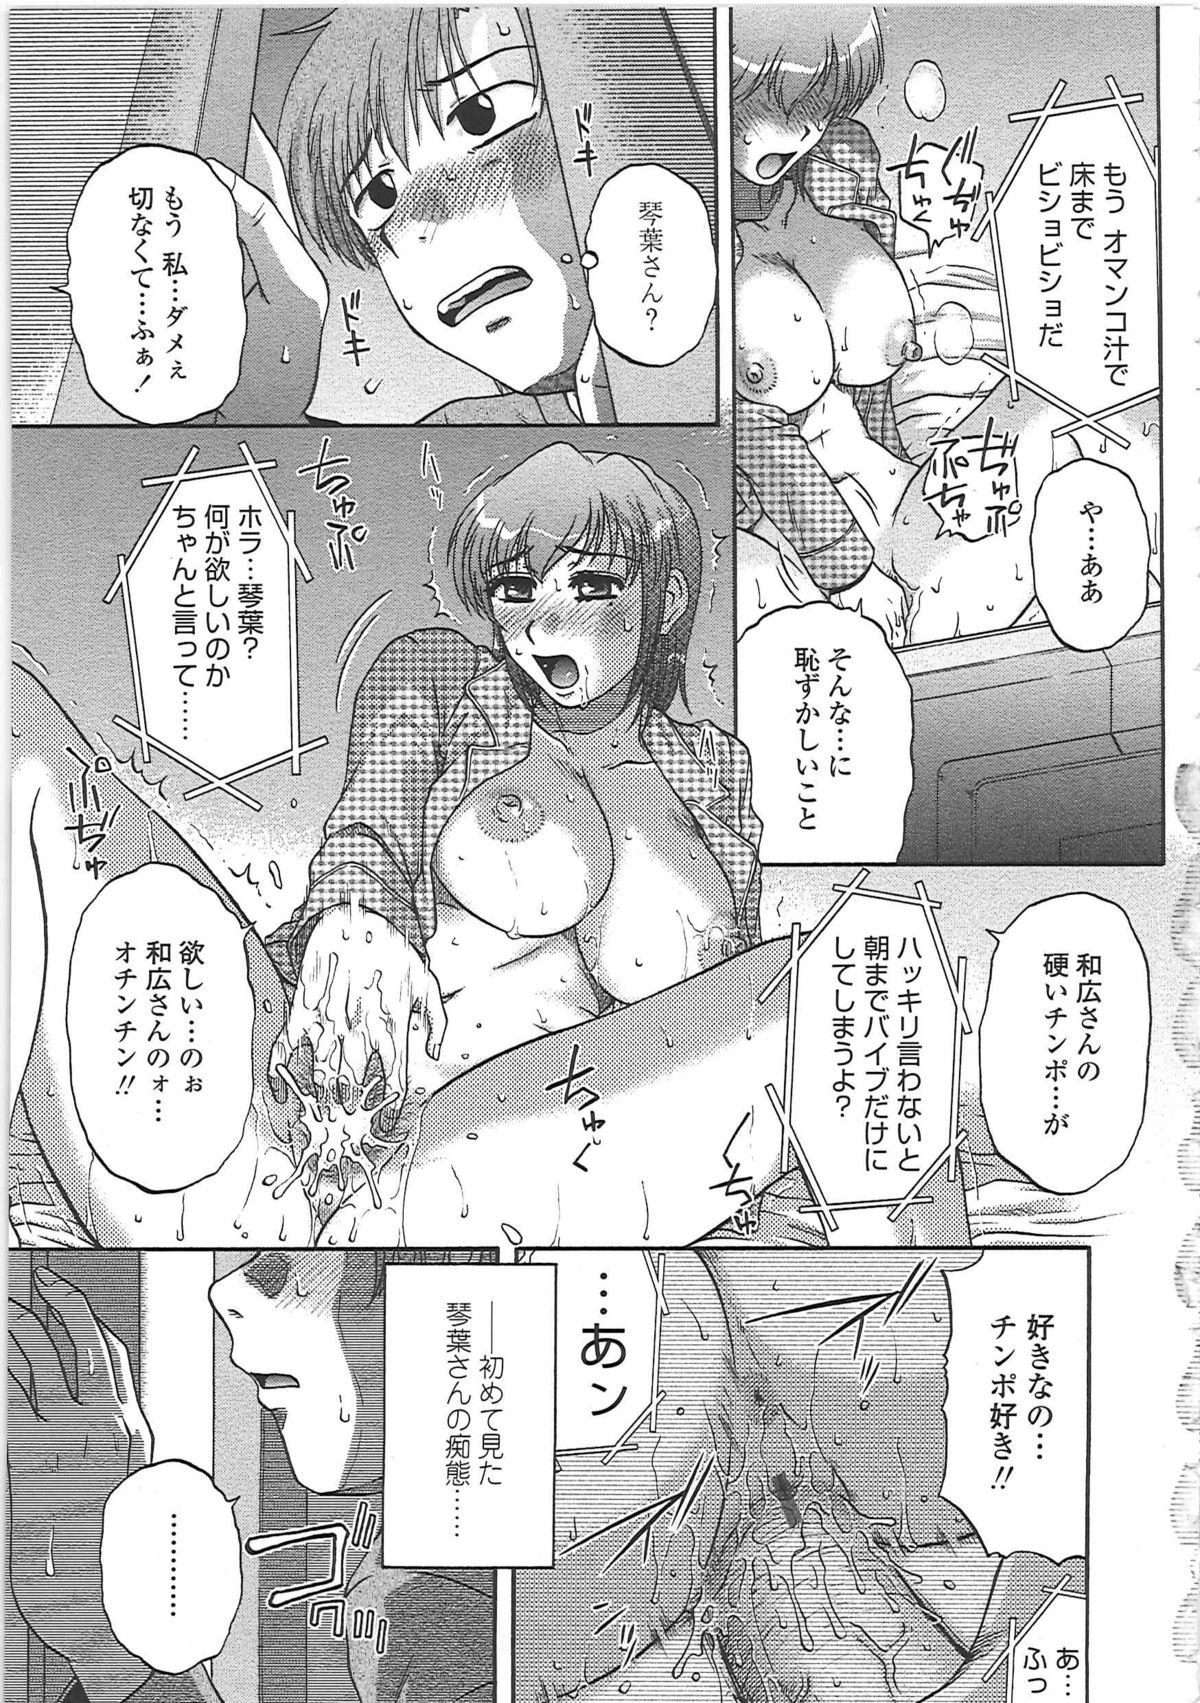 Nikuzuma Tsuushin - Erotic Wife Communication 51